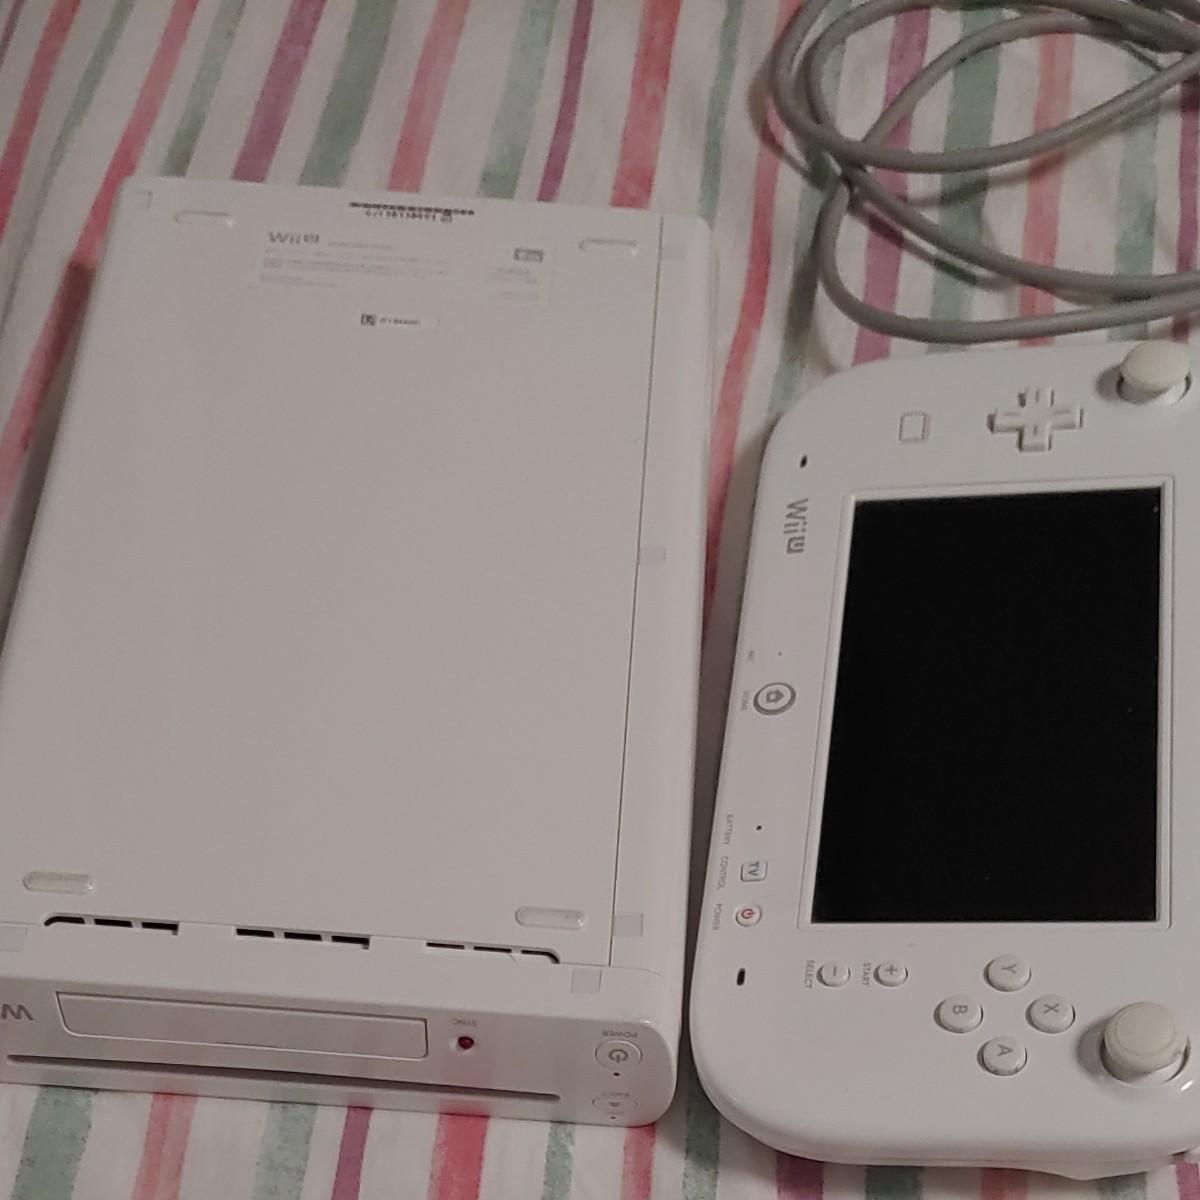 WiiU8ギガ シロ ゲームパッドセット